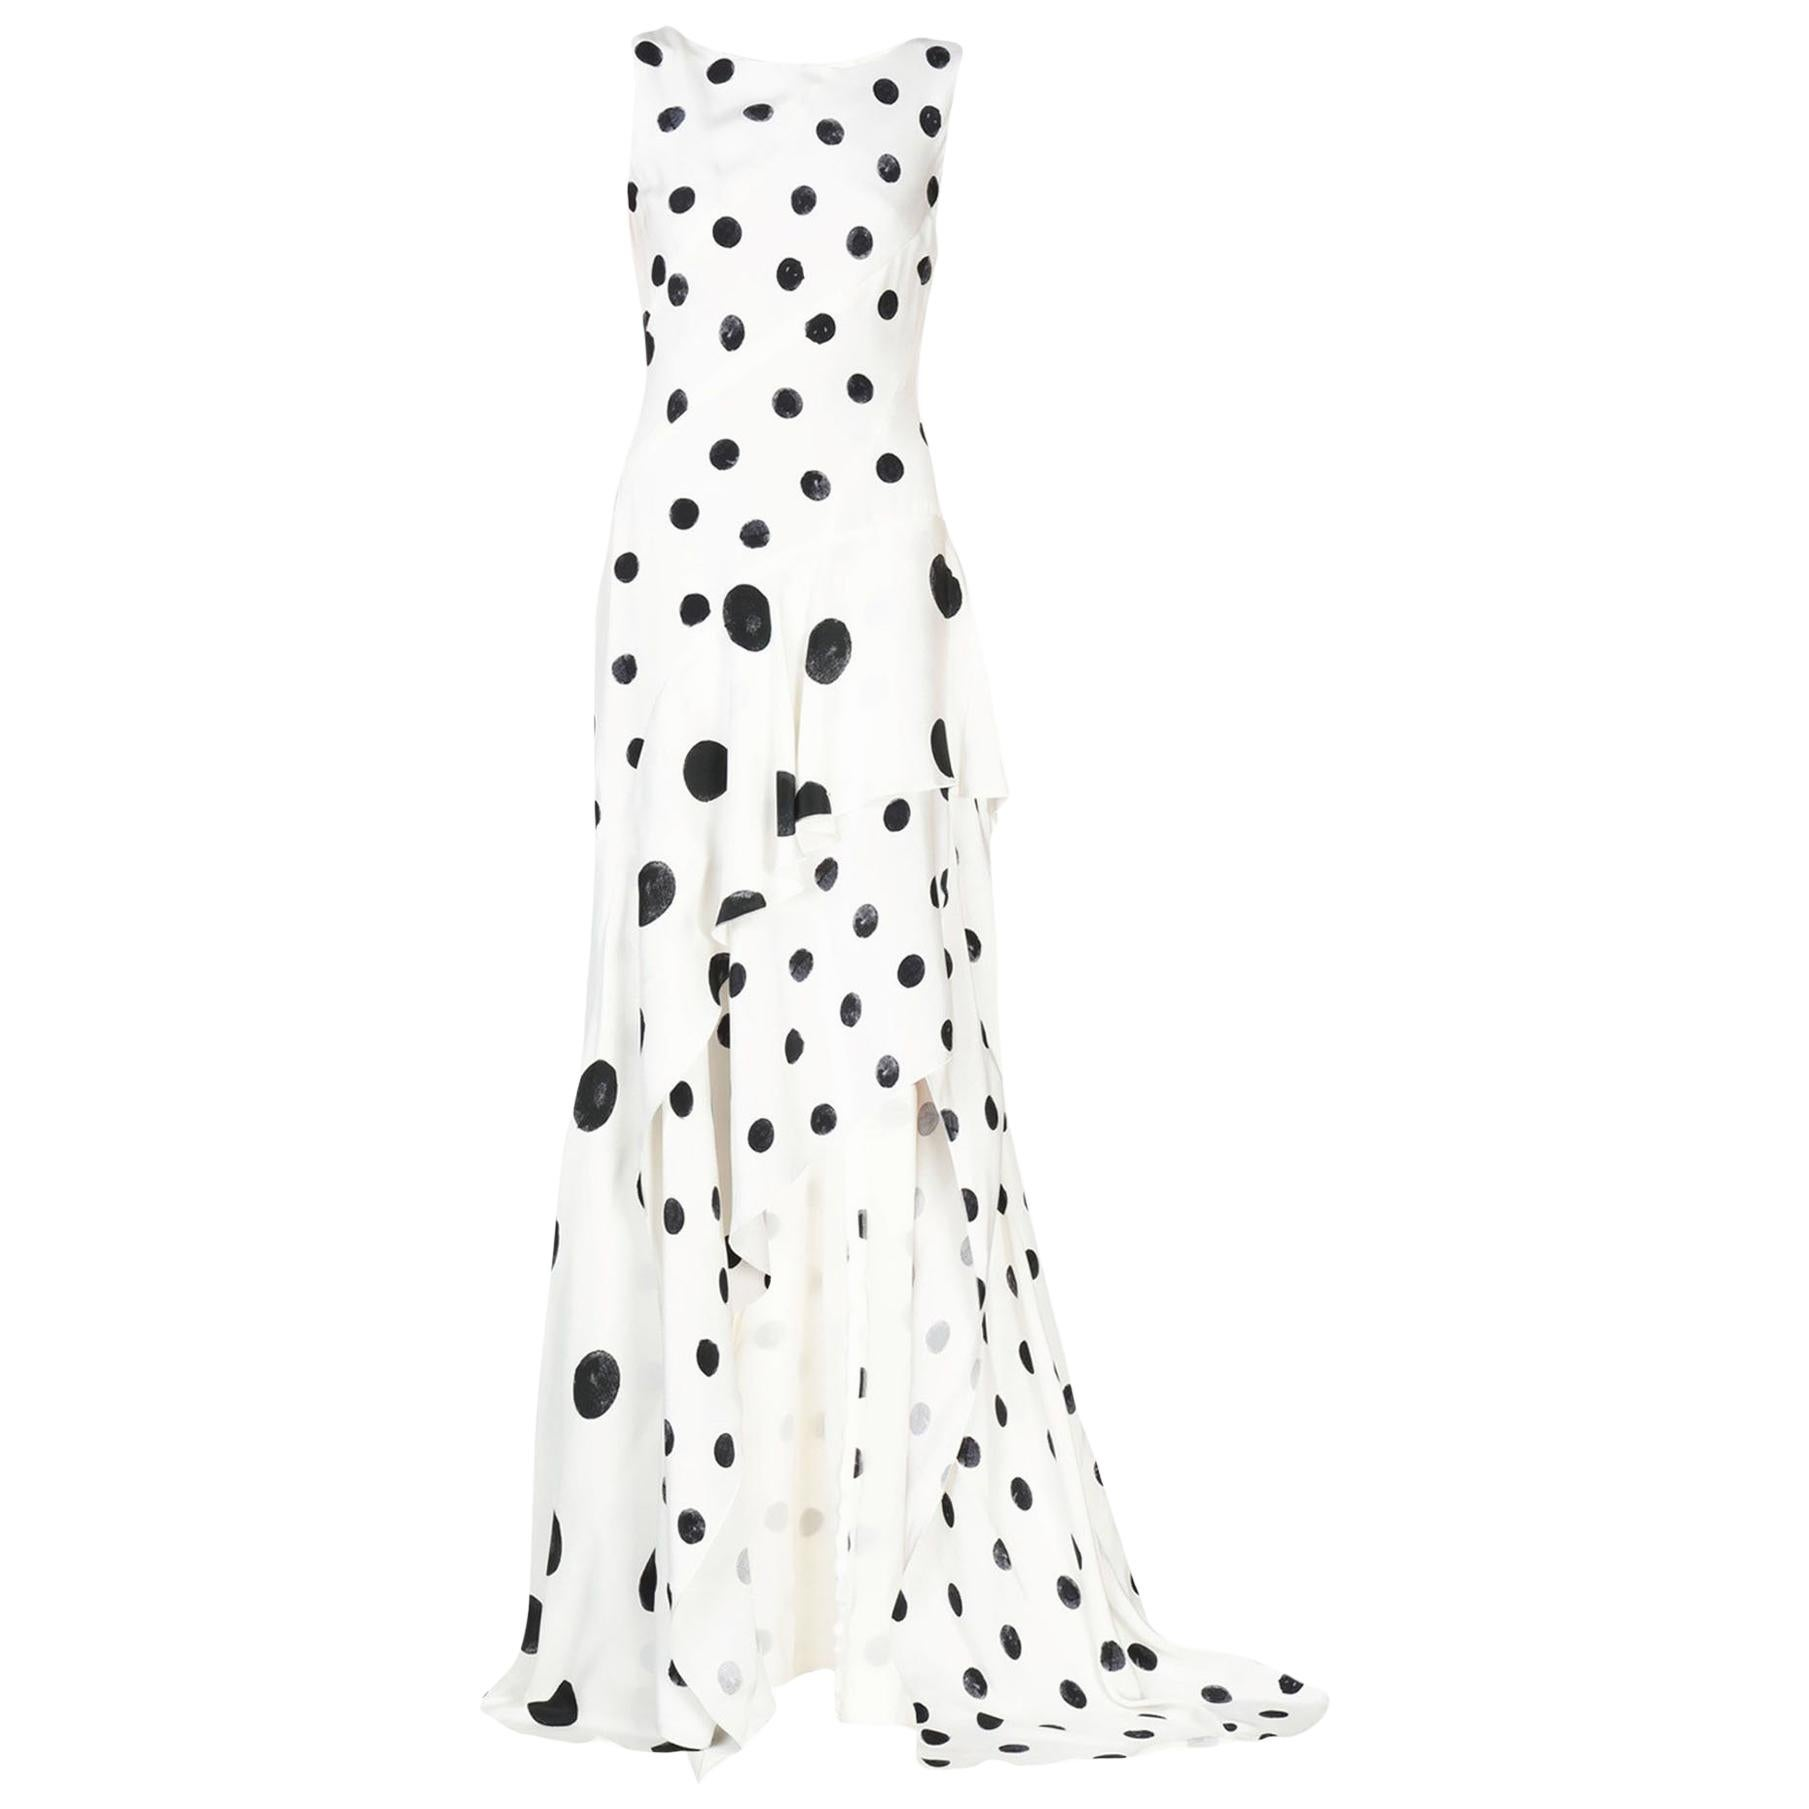 New Oscar De La Renta White Polka Dot Silk Crepe Tiered Skirt Dress Gown size 4